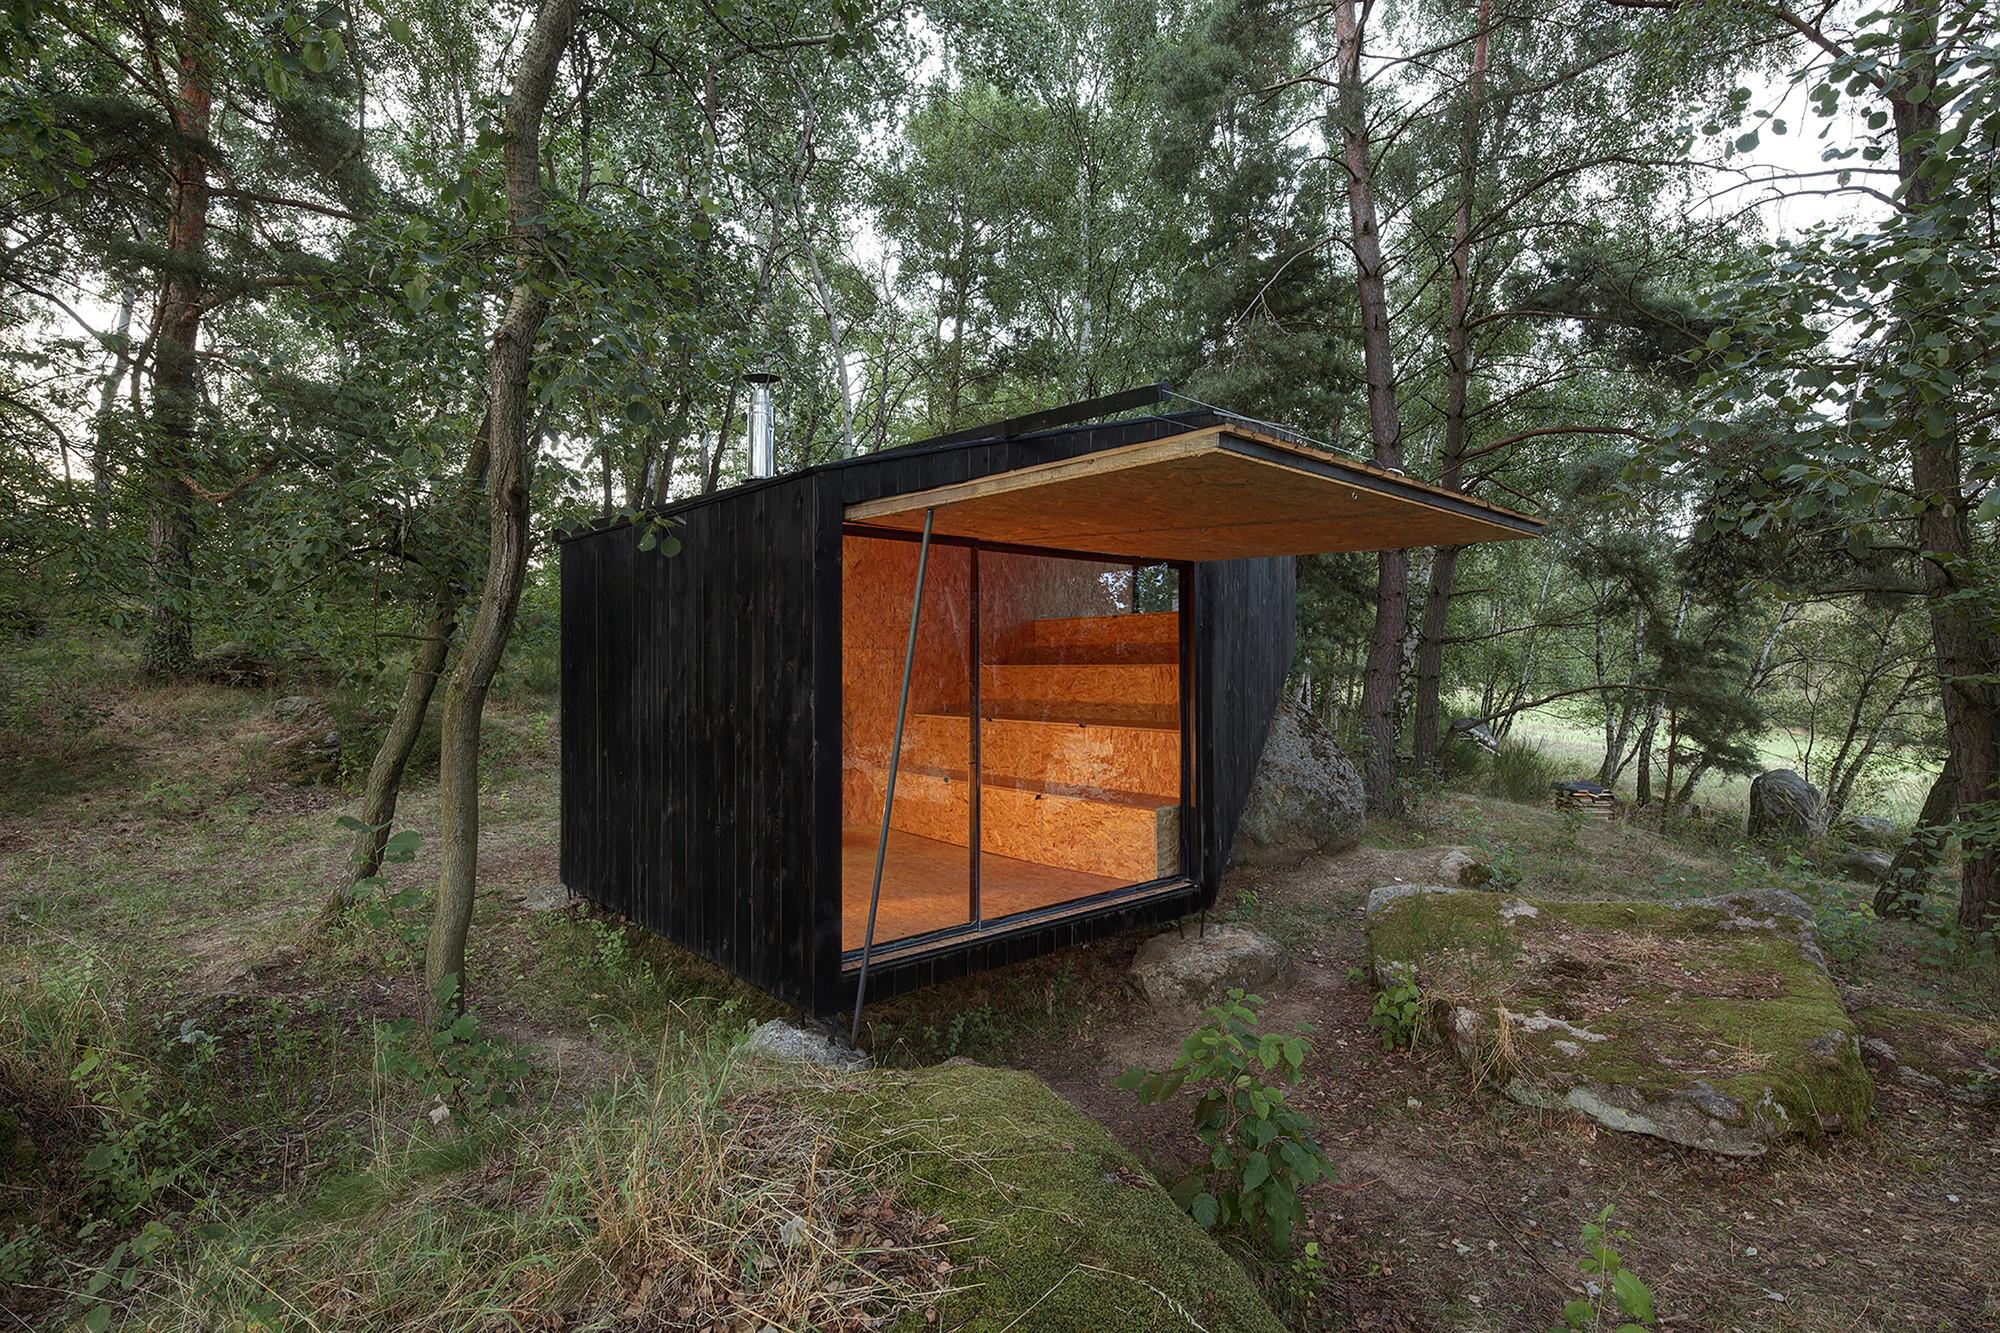 Gallery of forest retreat uhlik architekti 2 for Case moderne poco costose